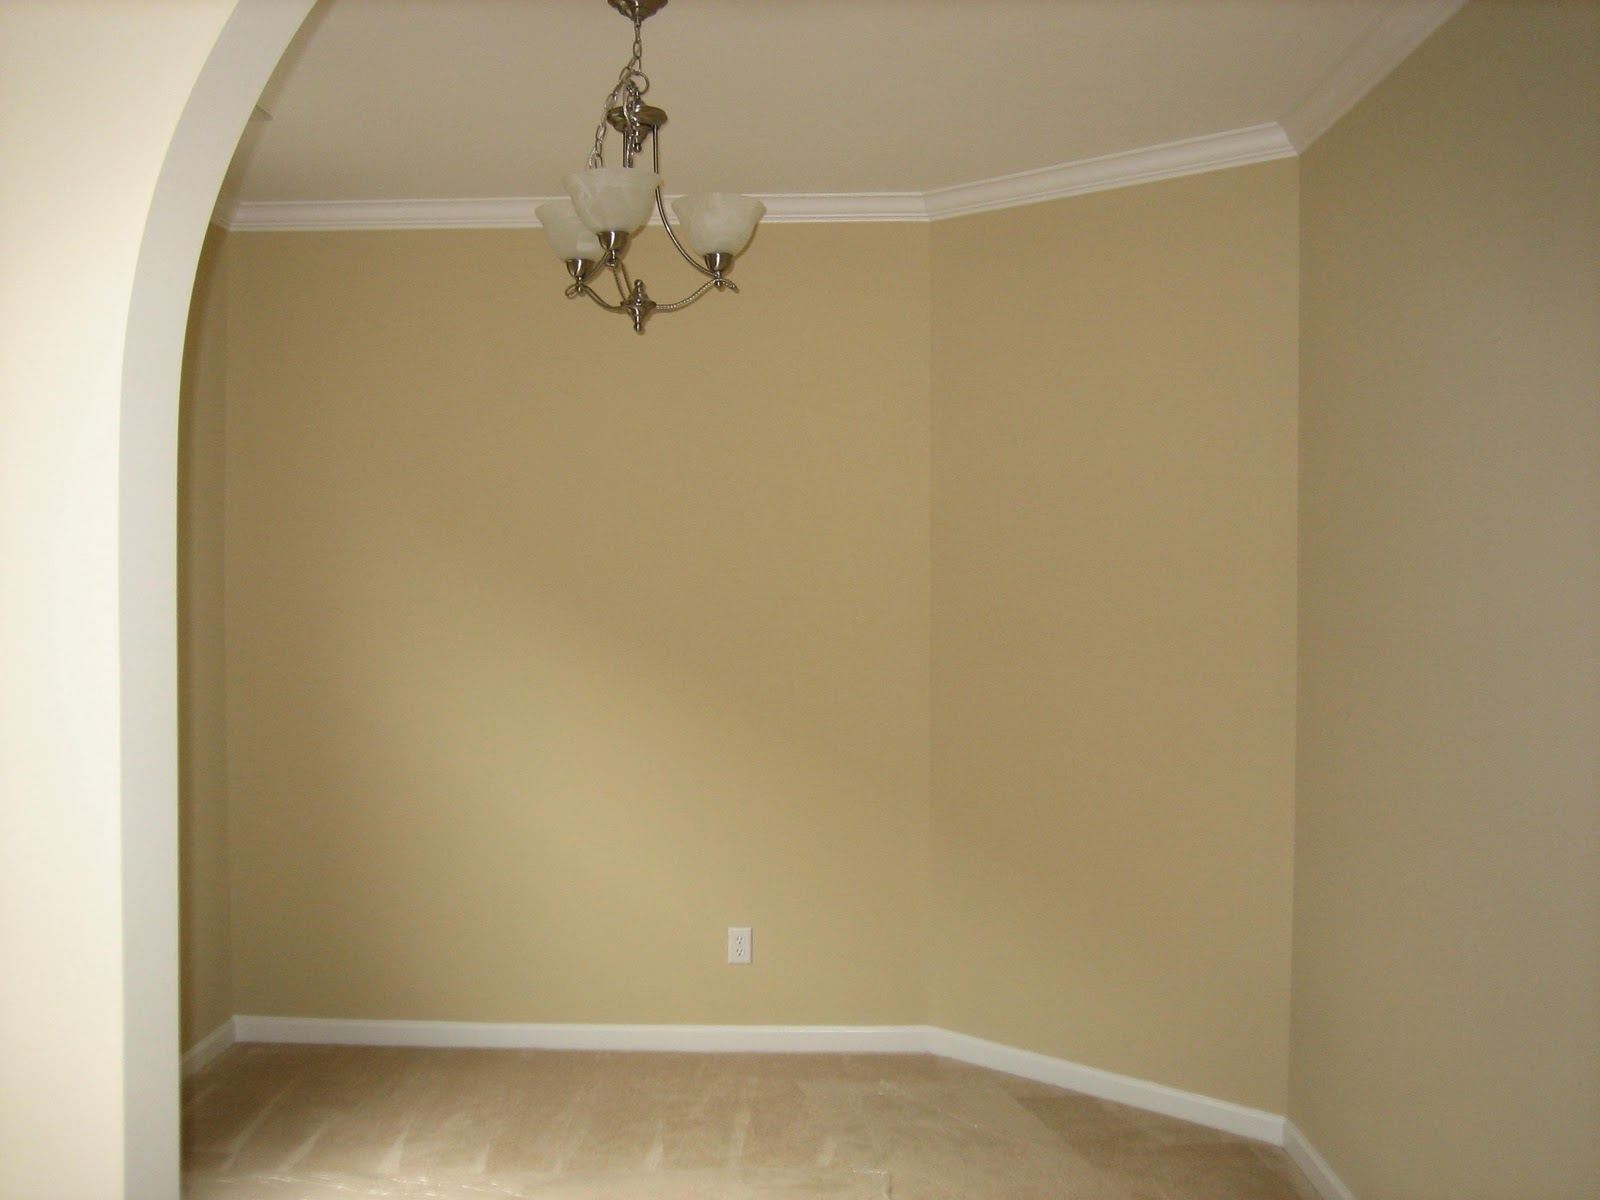 high definition wallpapercomphotosherwin williams wallpaper26html 1600x1200